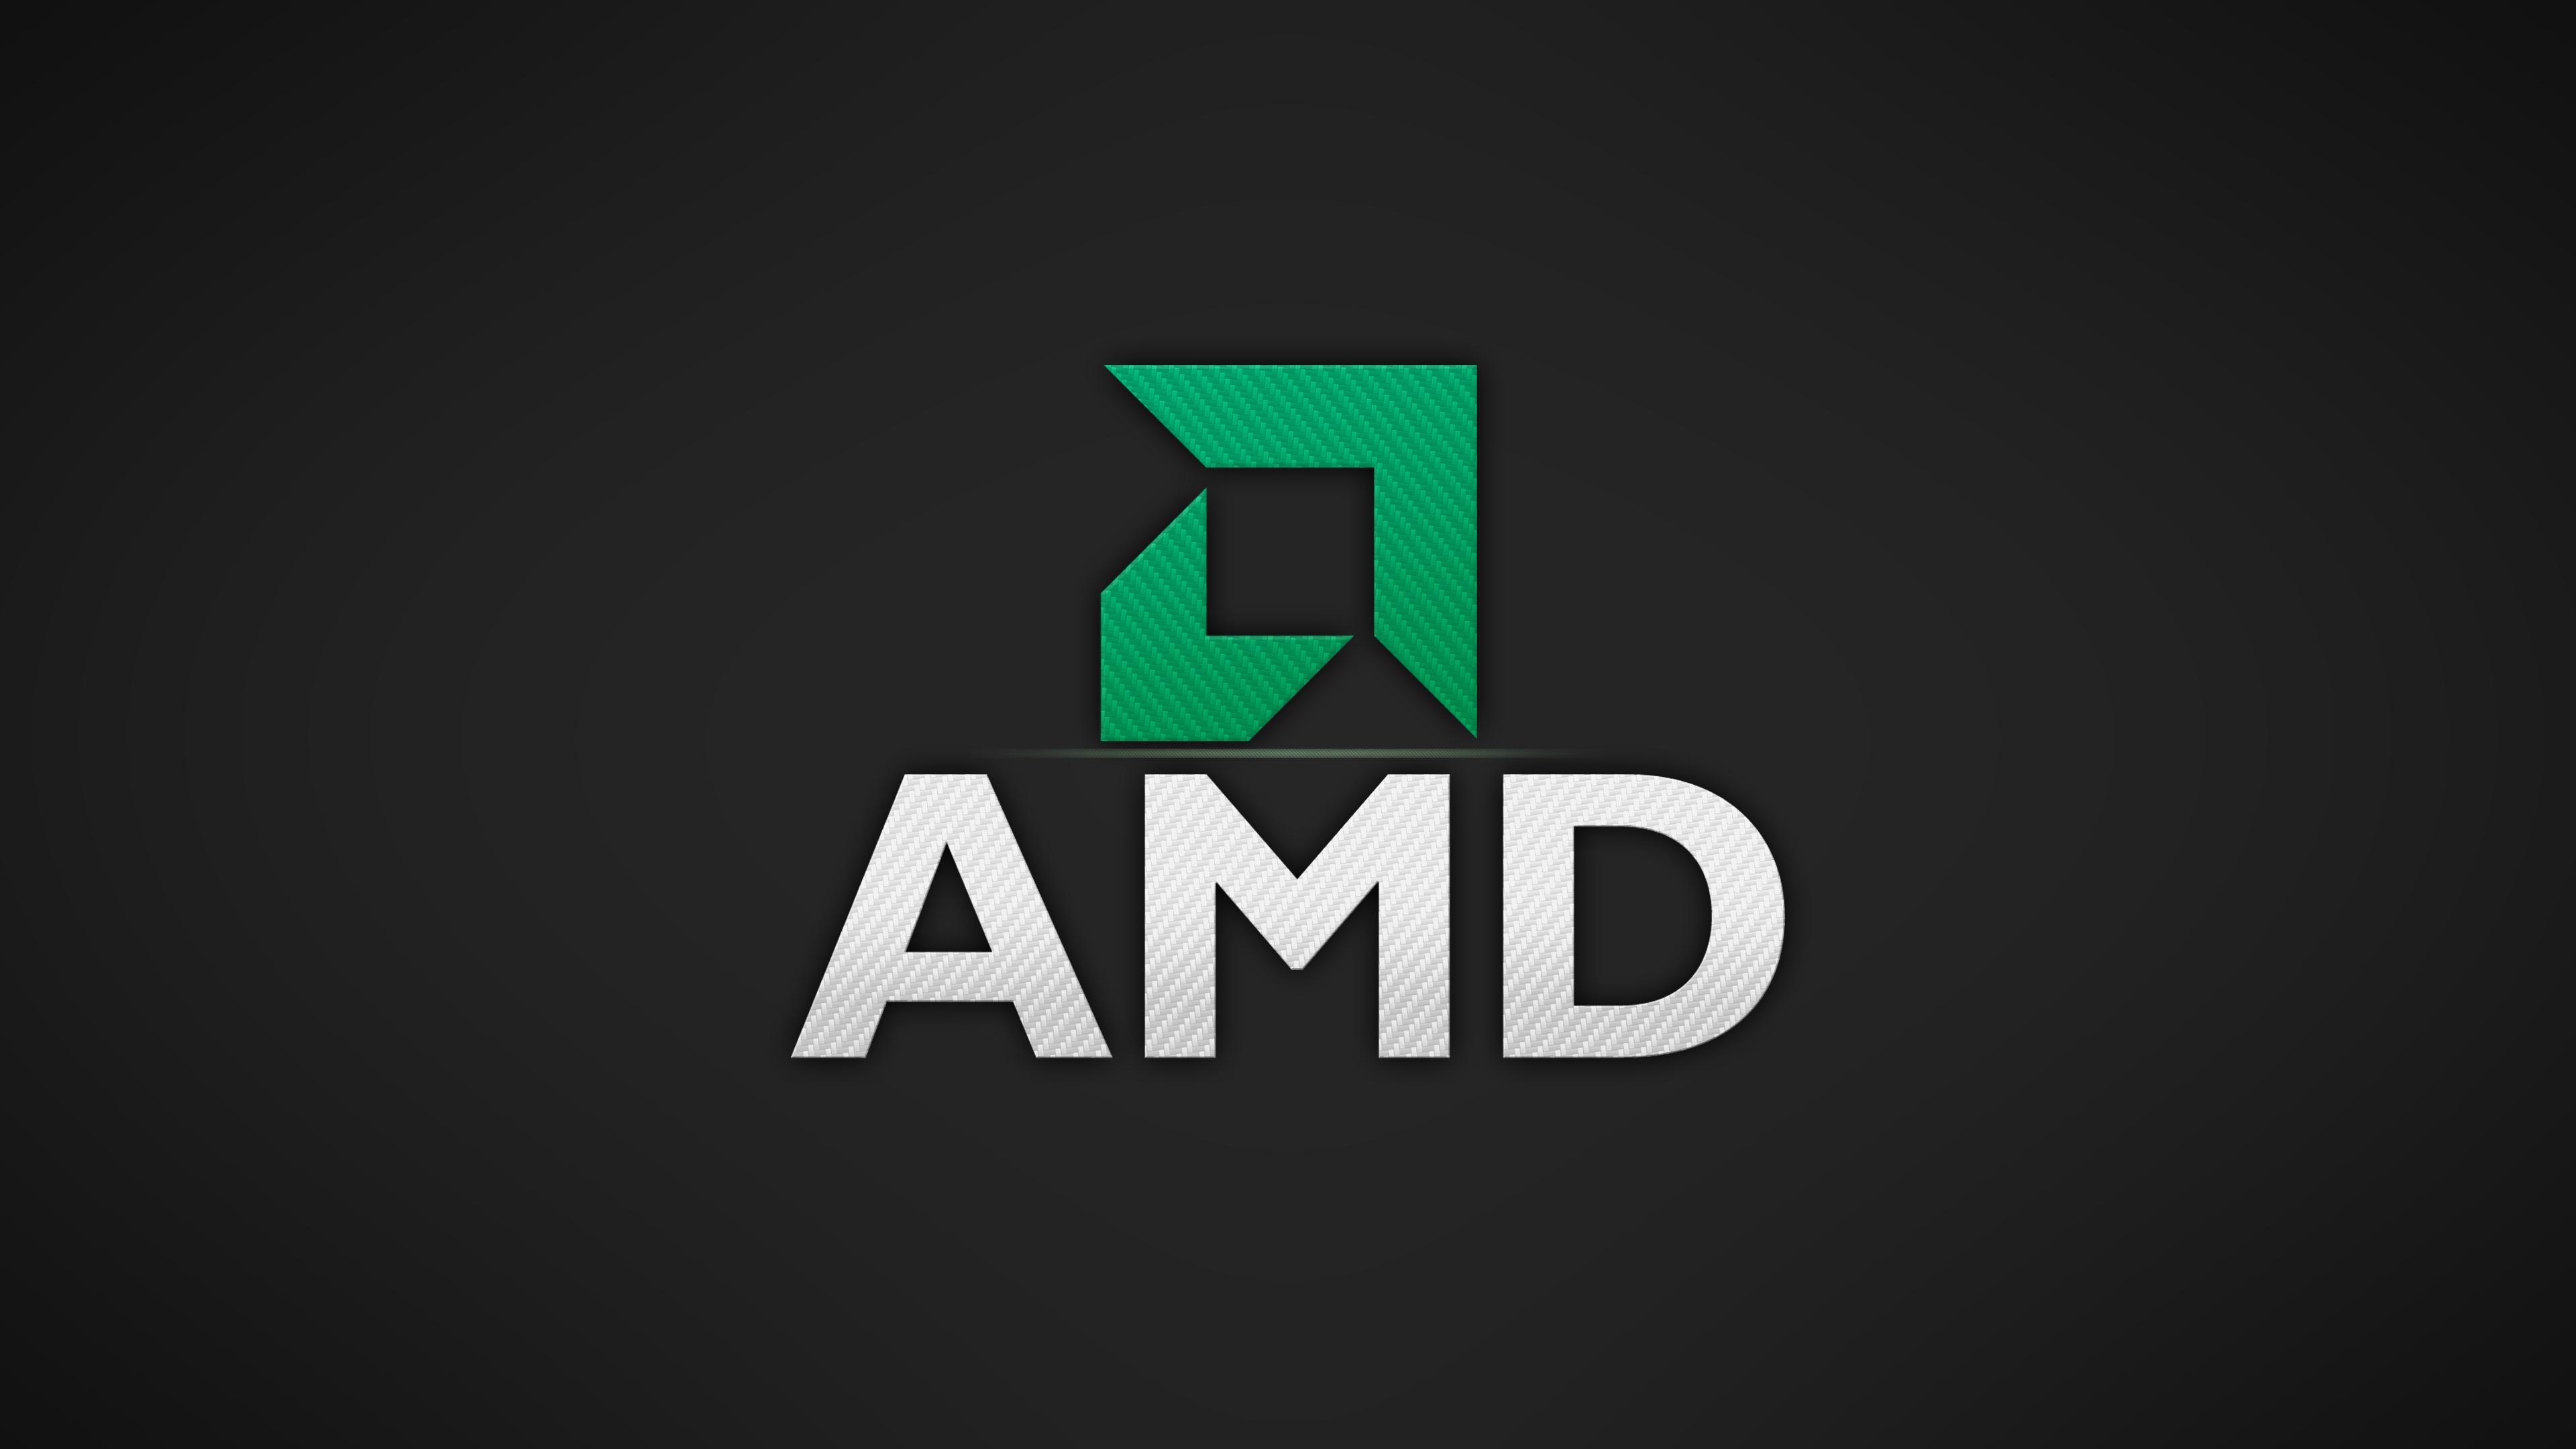 4K] carbon AMD wallpaper hope you like it 3840x2160